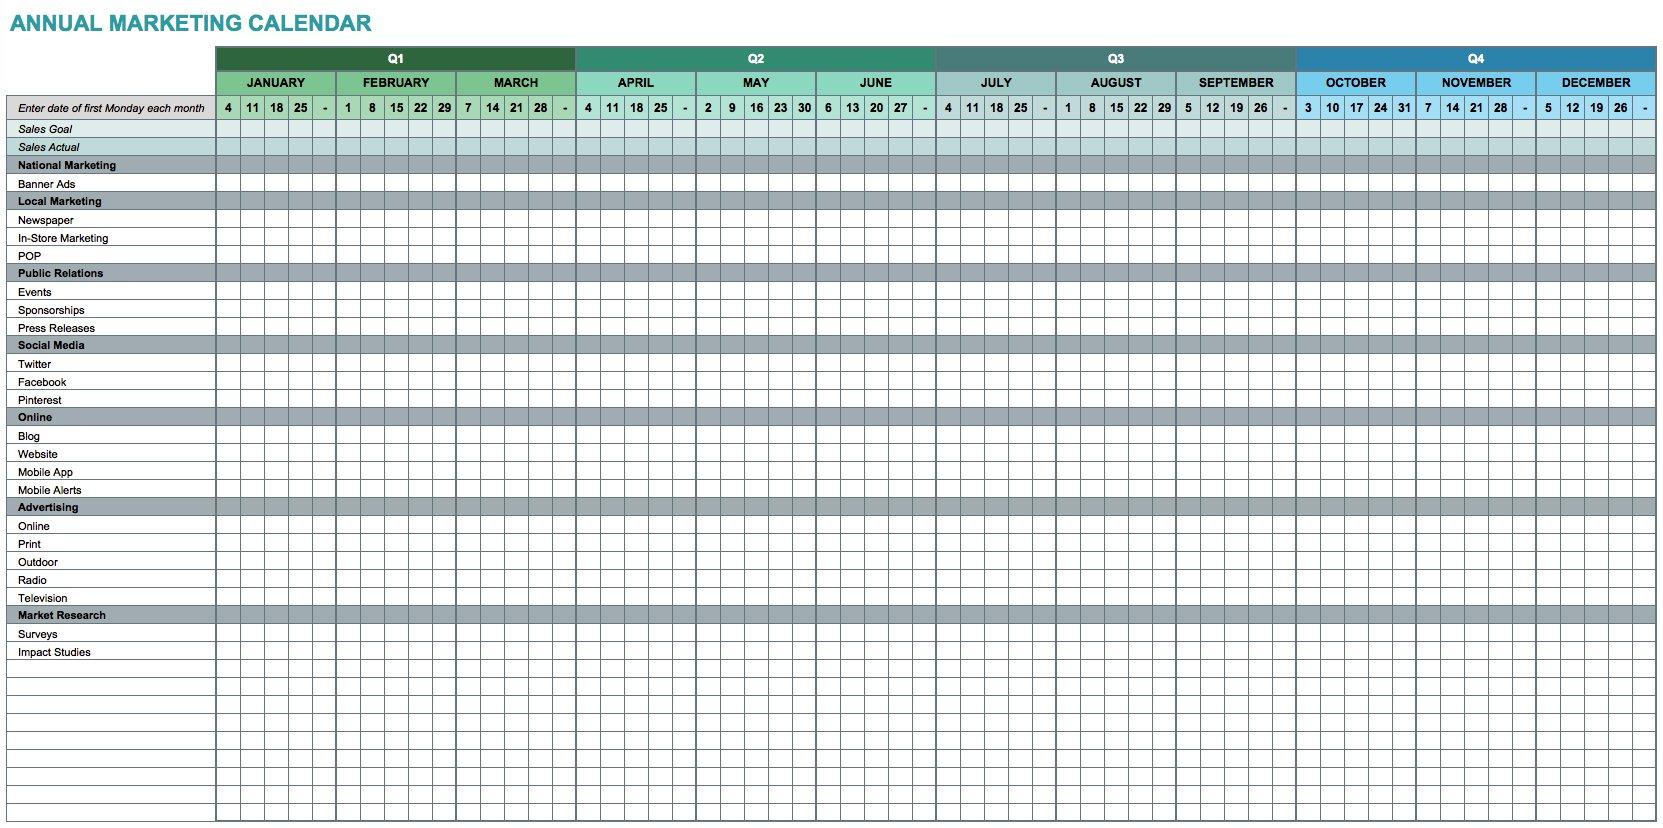 9 Free Marketing Calendar Templates For Excel - Smartsheet within Event Calendar Templates Excel Printable